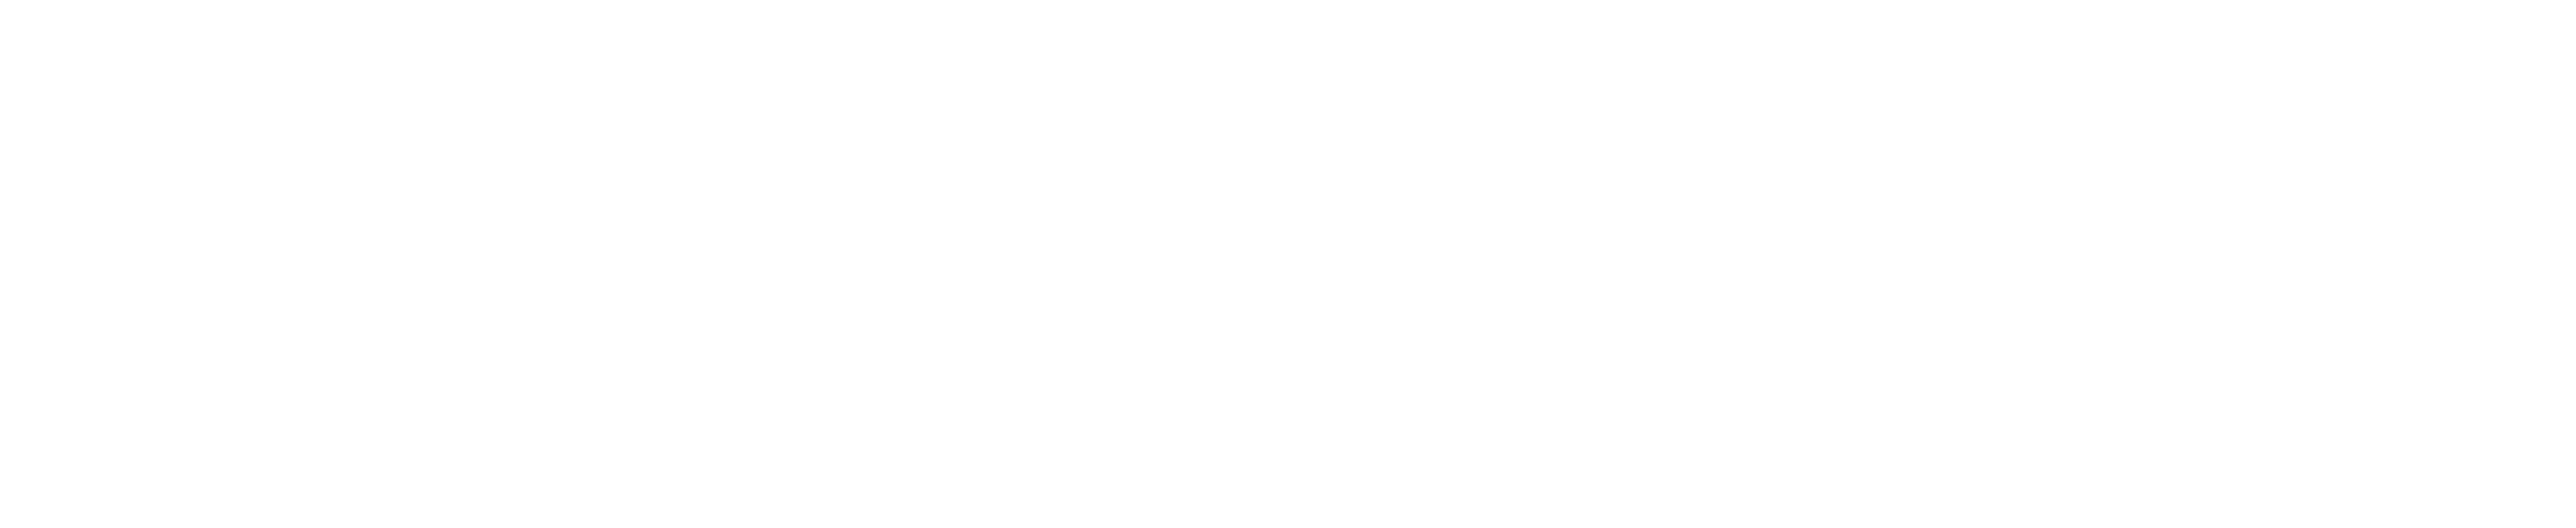 GobEstado Guerrero